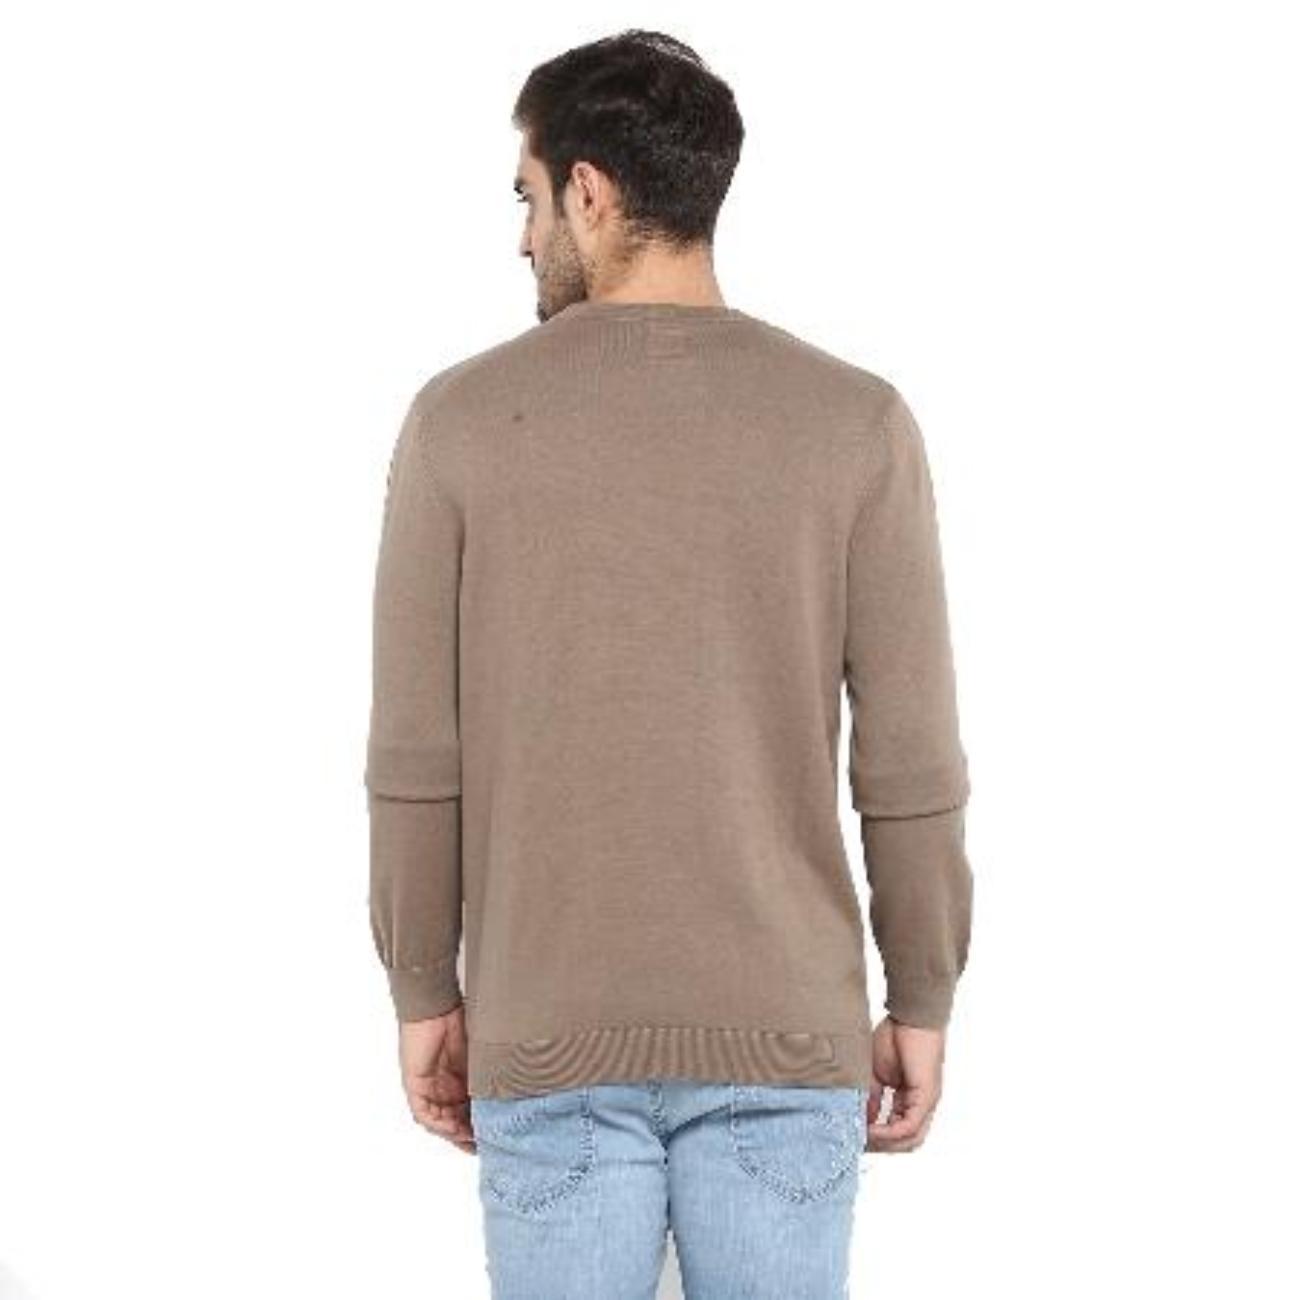 Shop Brown Sweater for Men Online